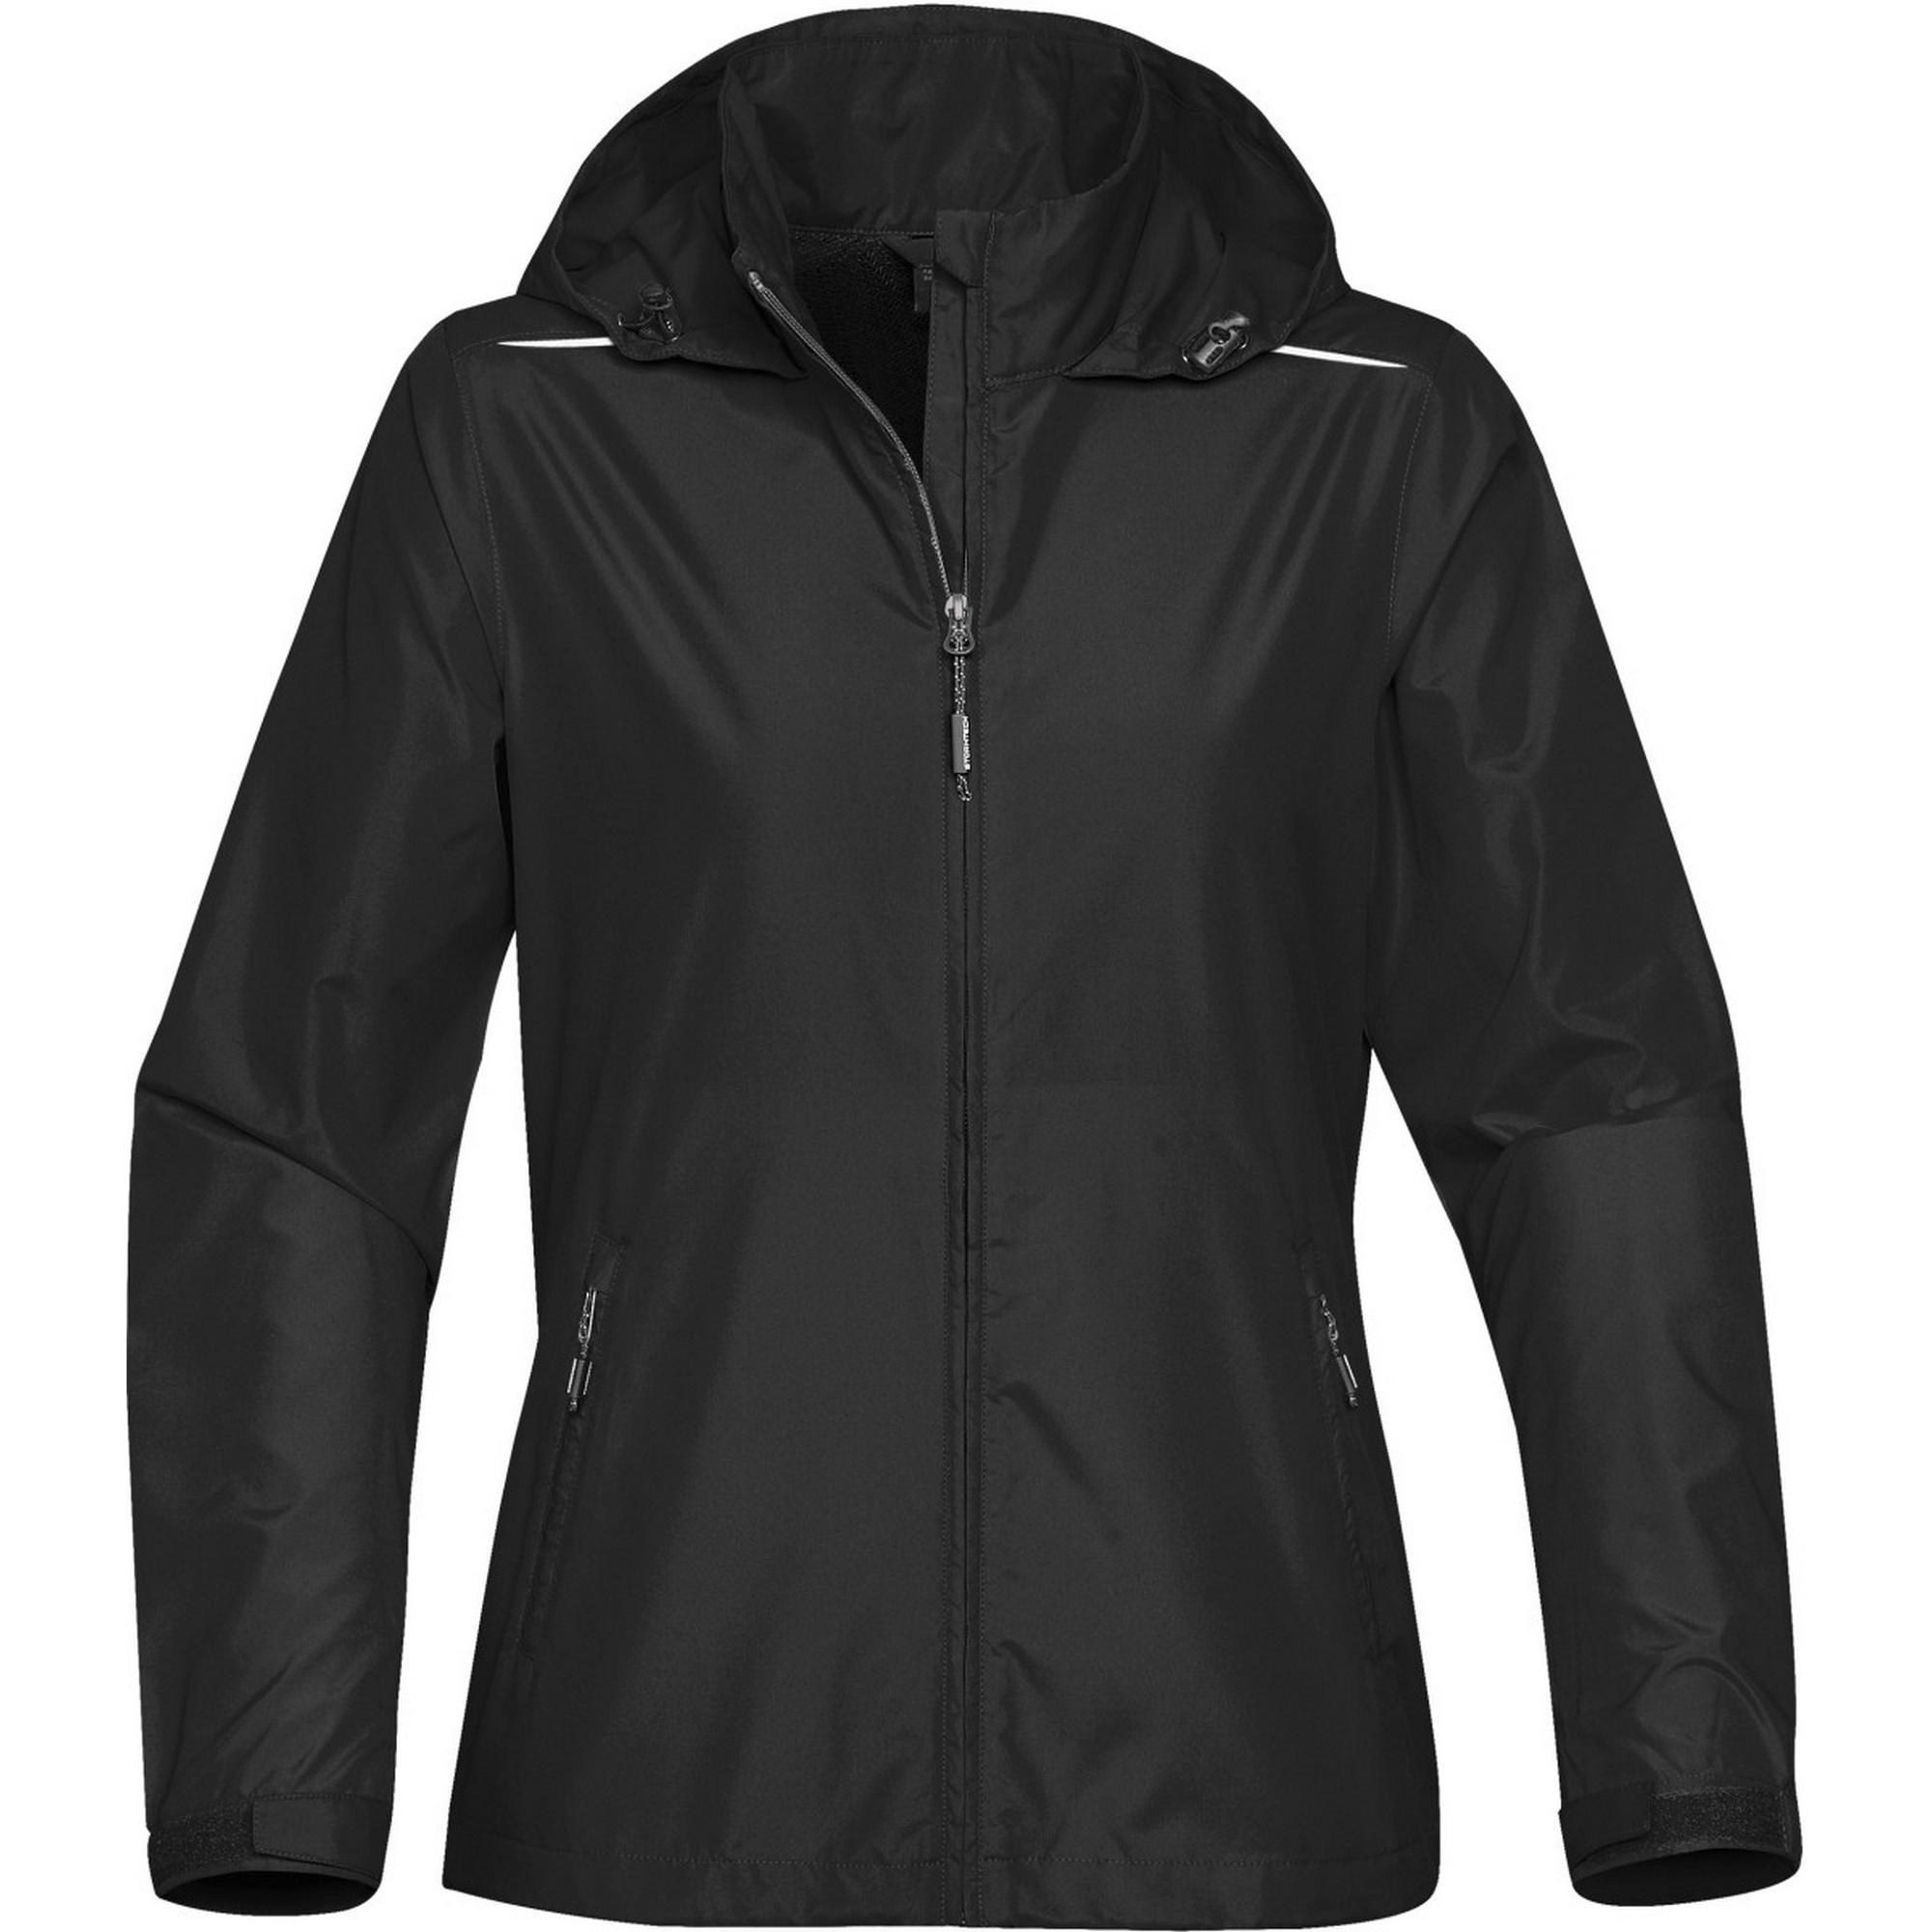 Stormtech Womens/Ladies Nautilus Performance Shell Jacket (S) (Black)